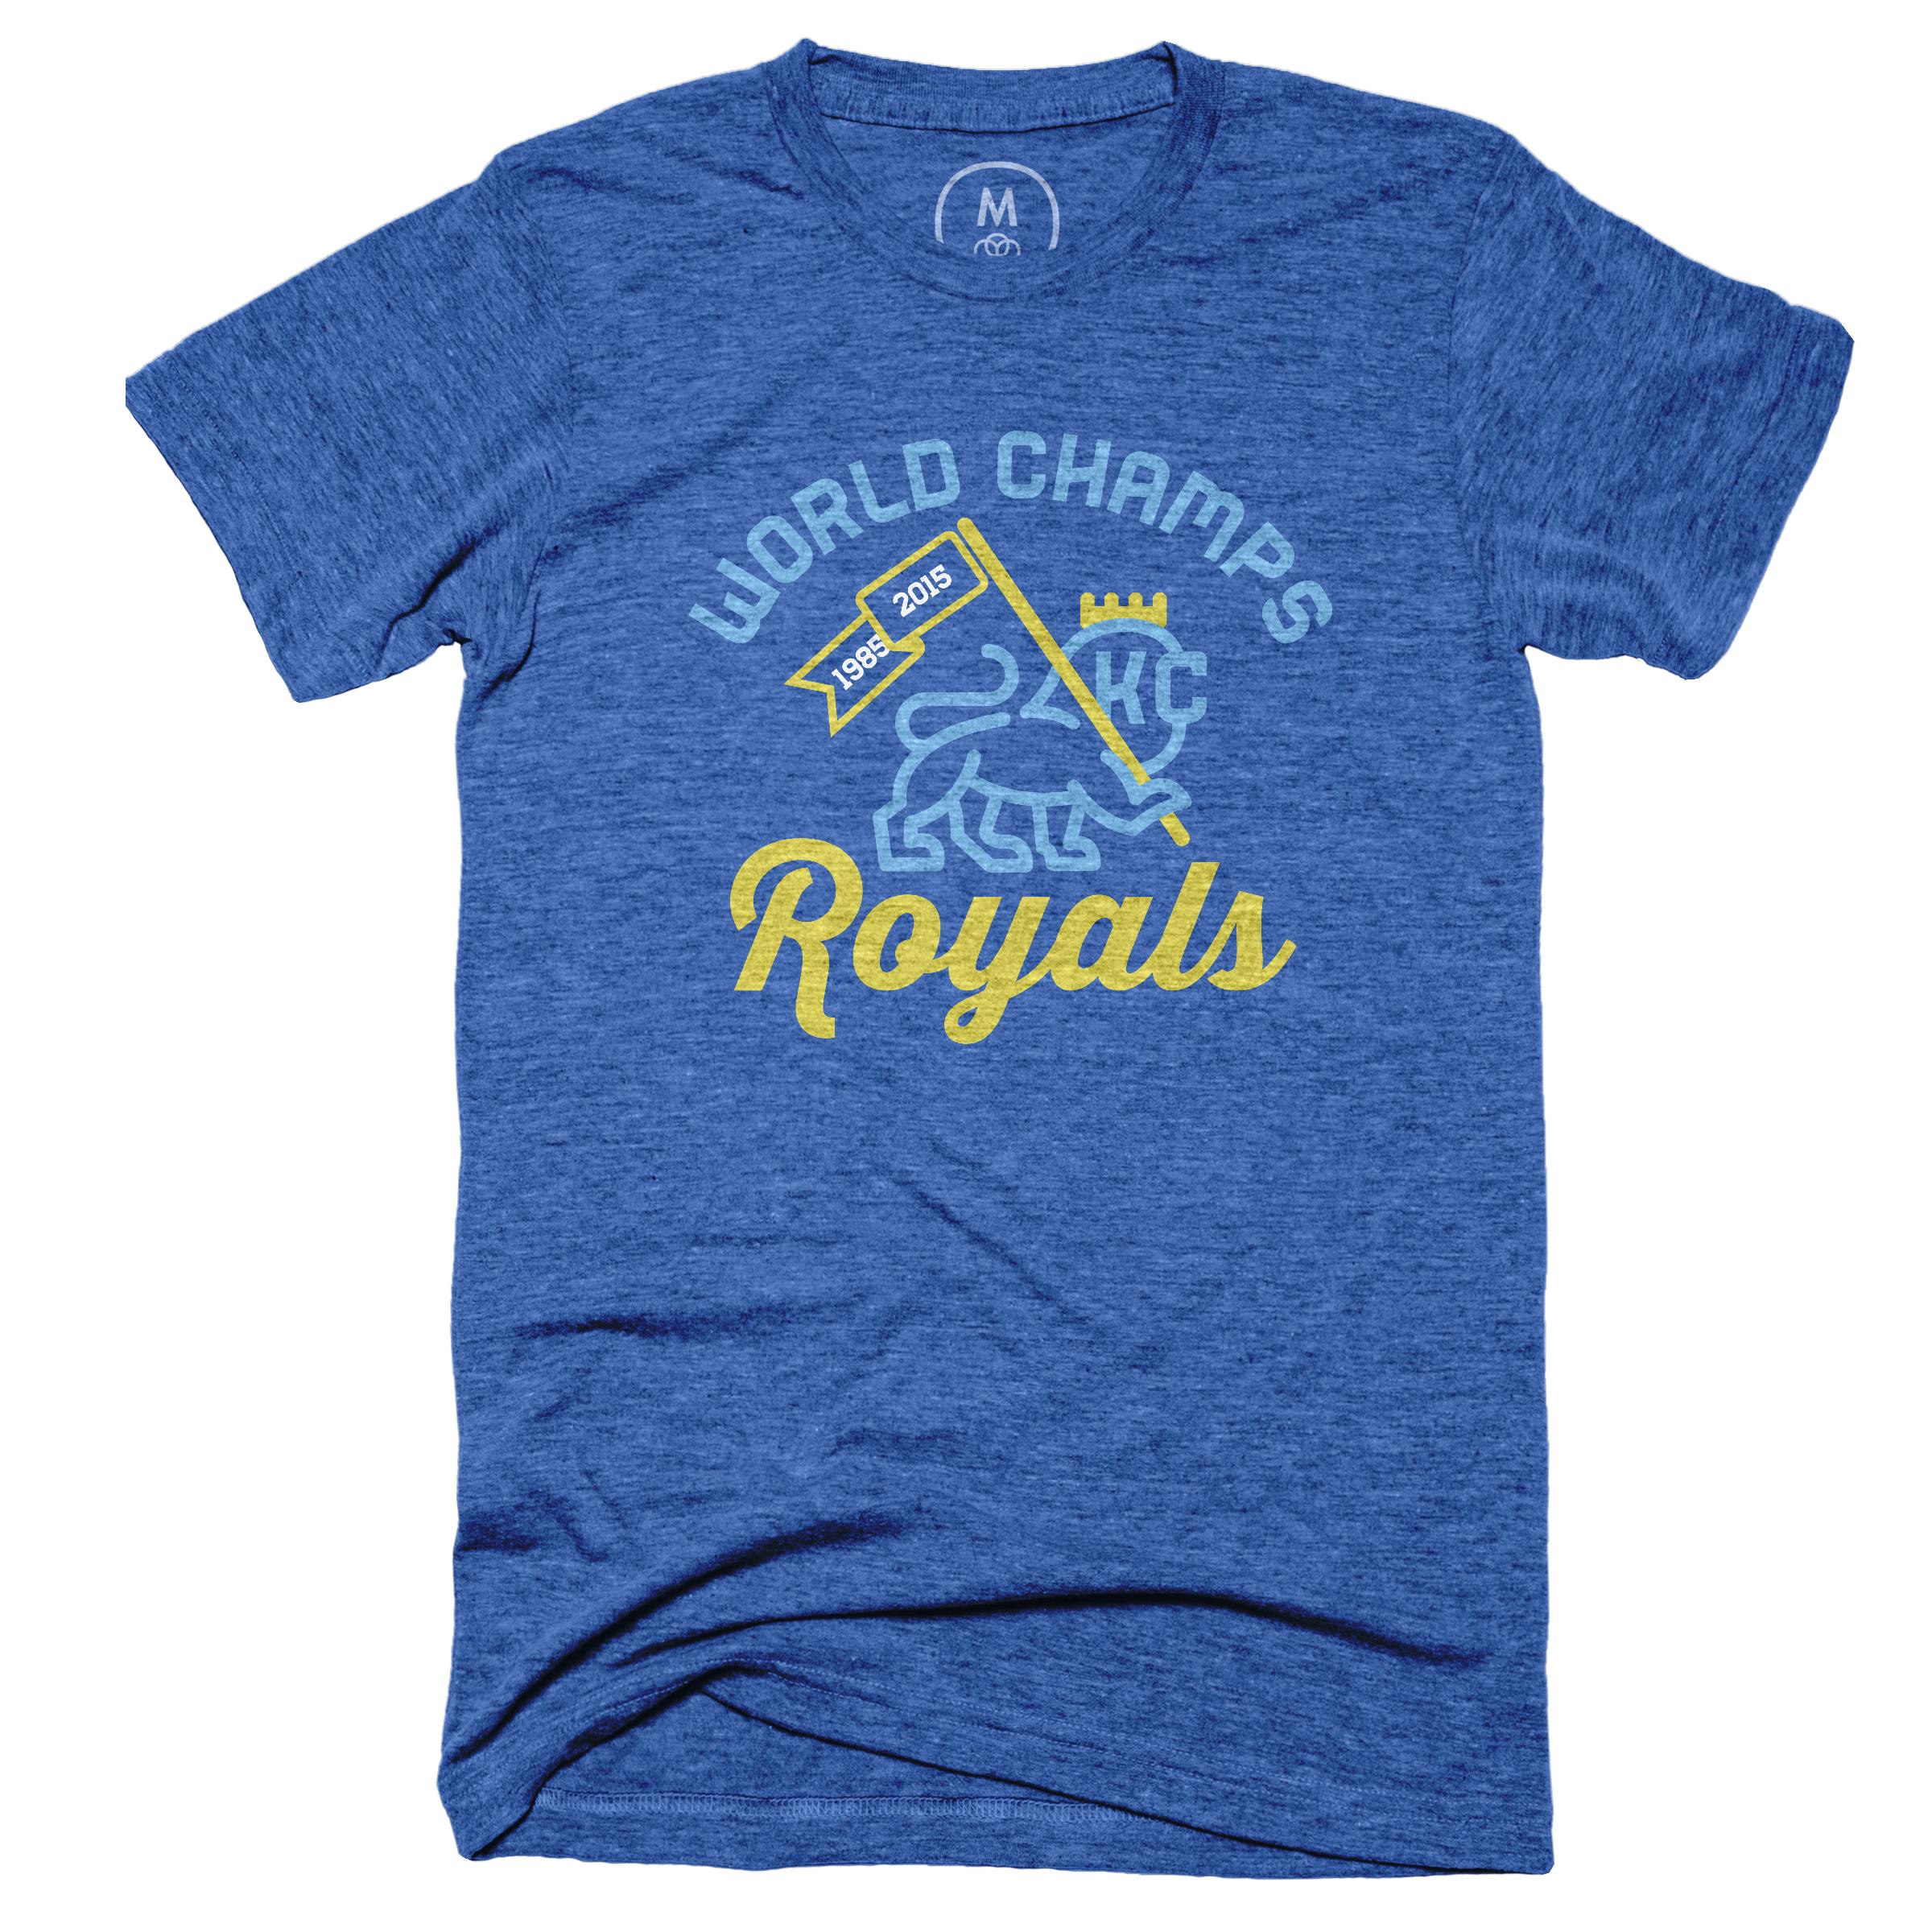 World Champs - Kansas City Royals